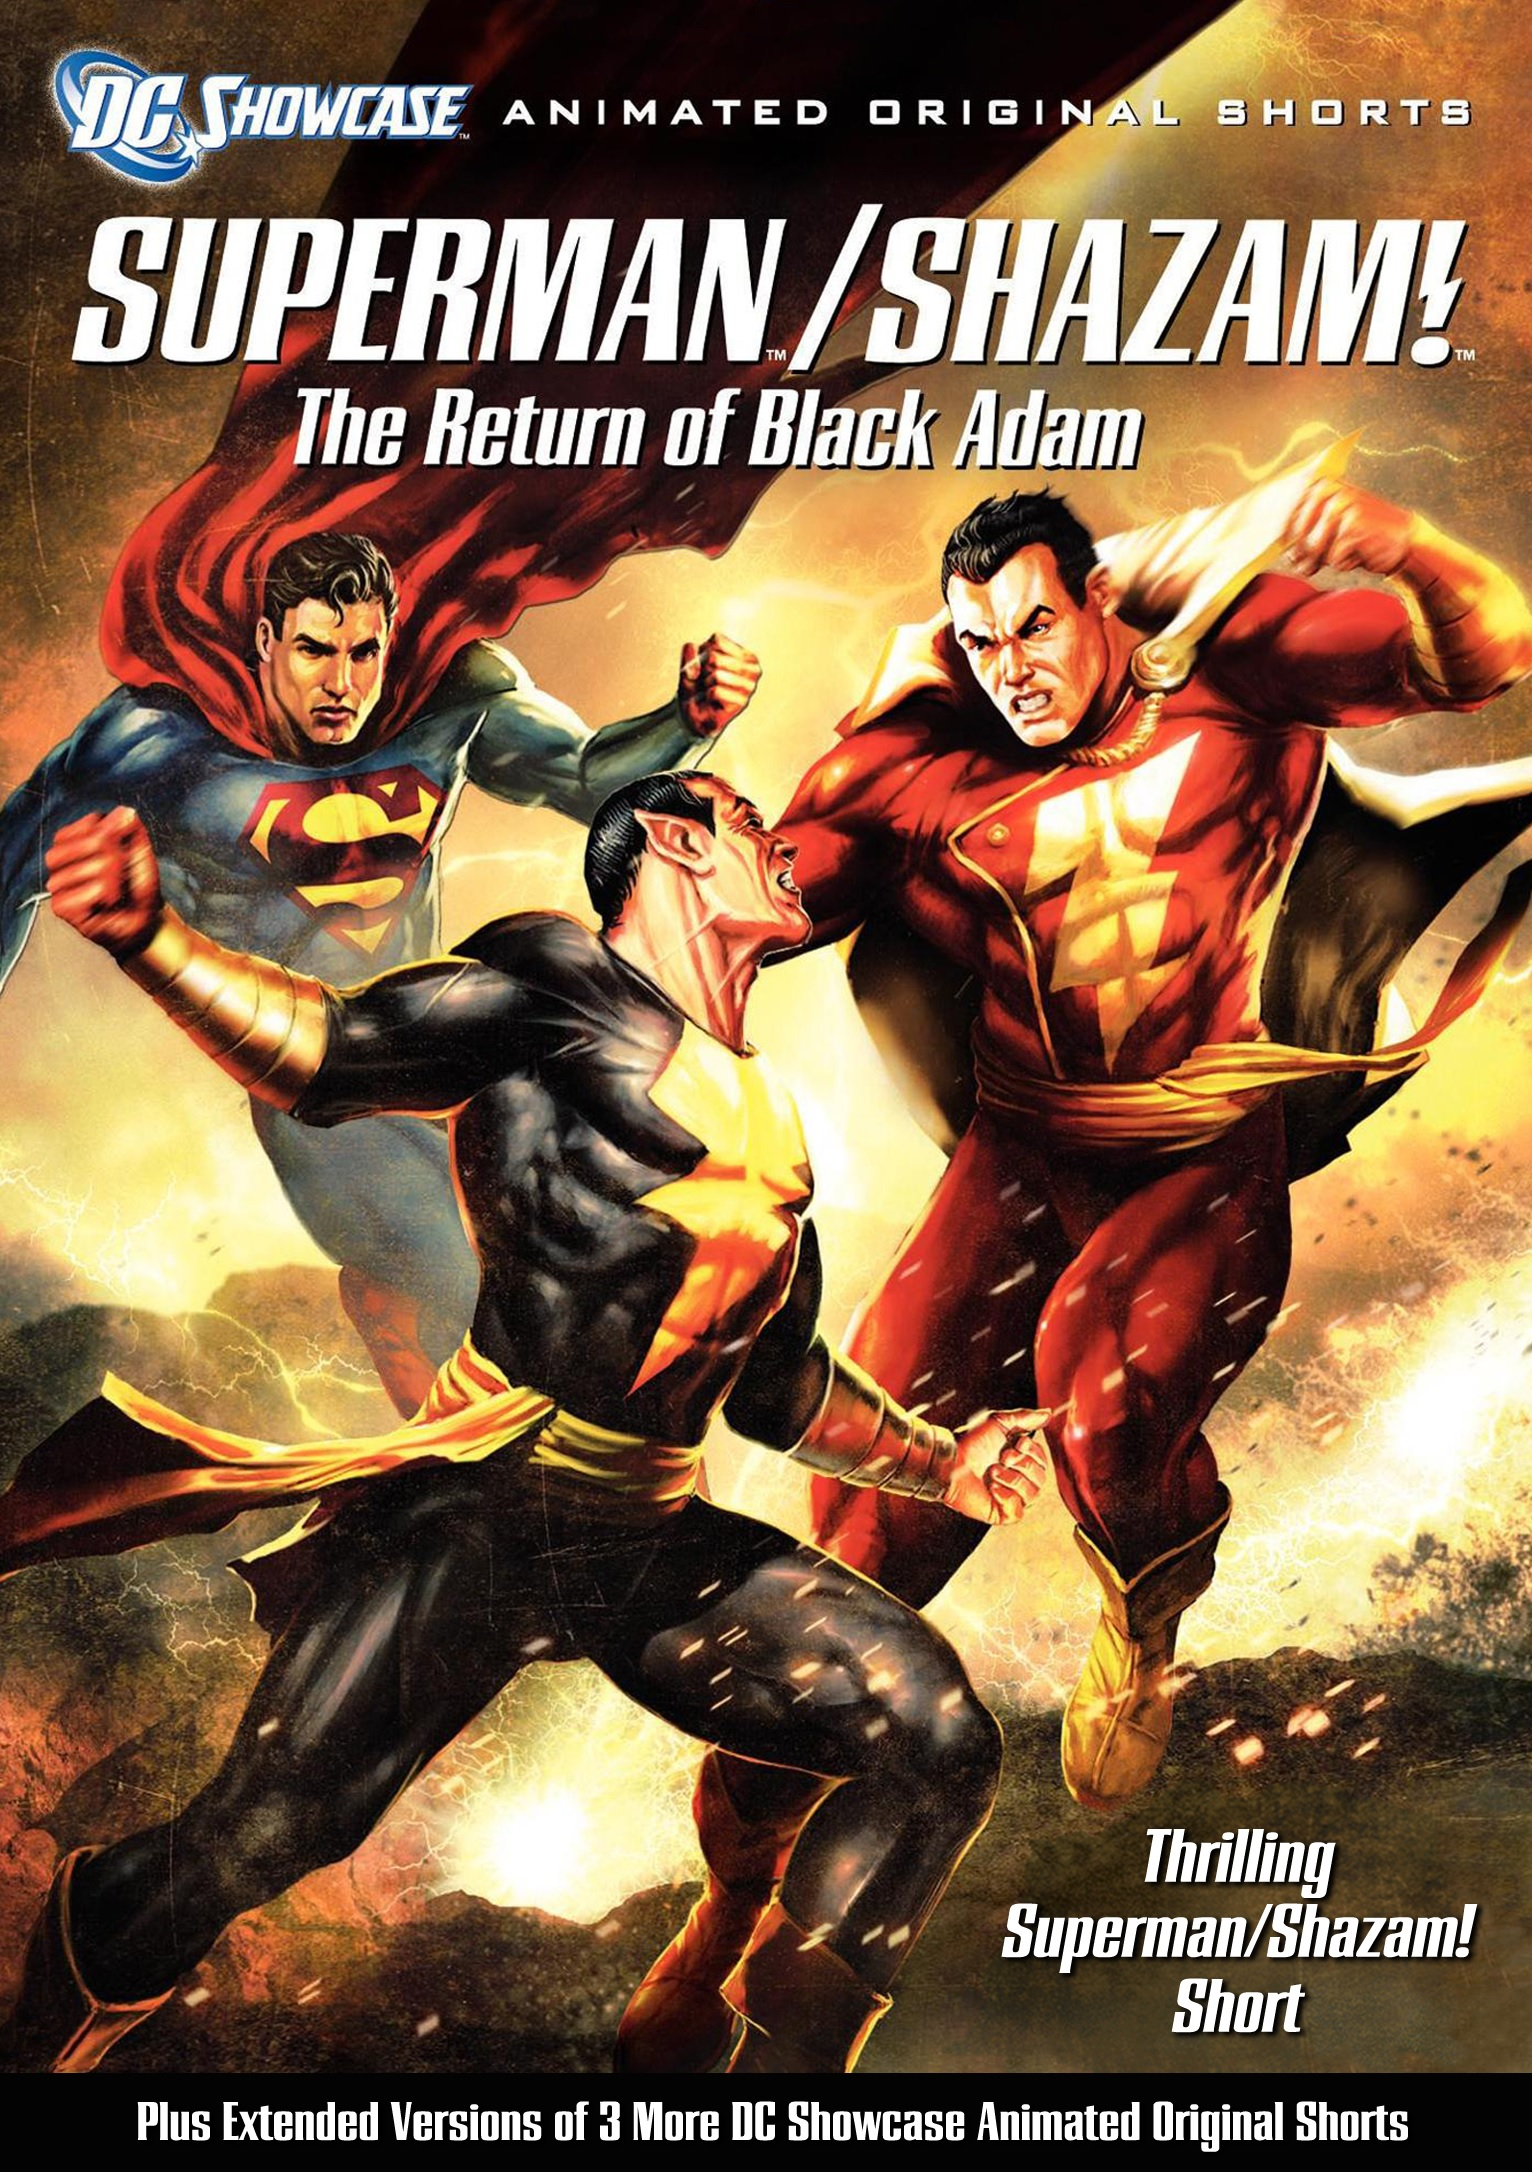 Superman Shazam! The Return of Black Adam